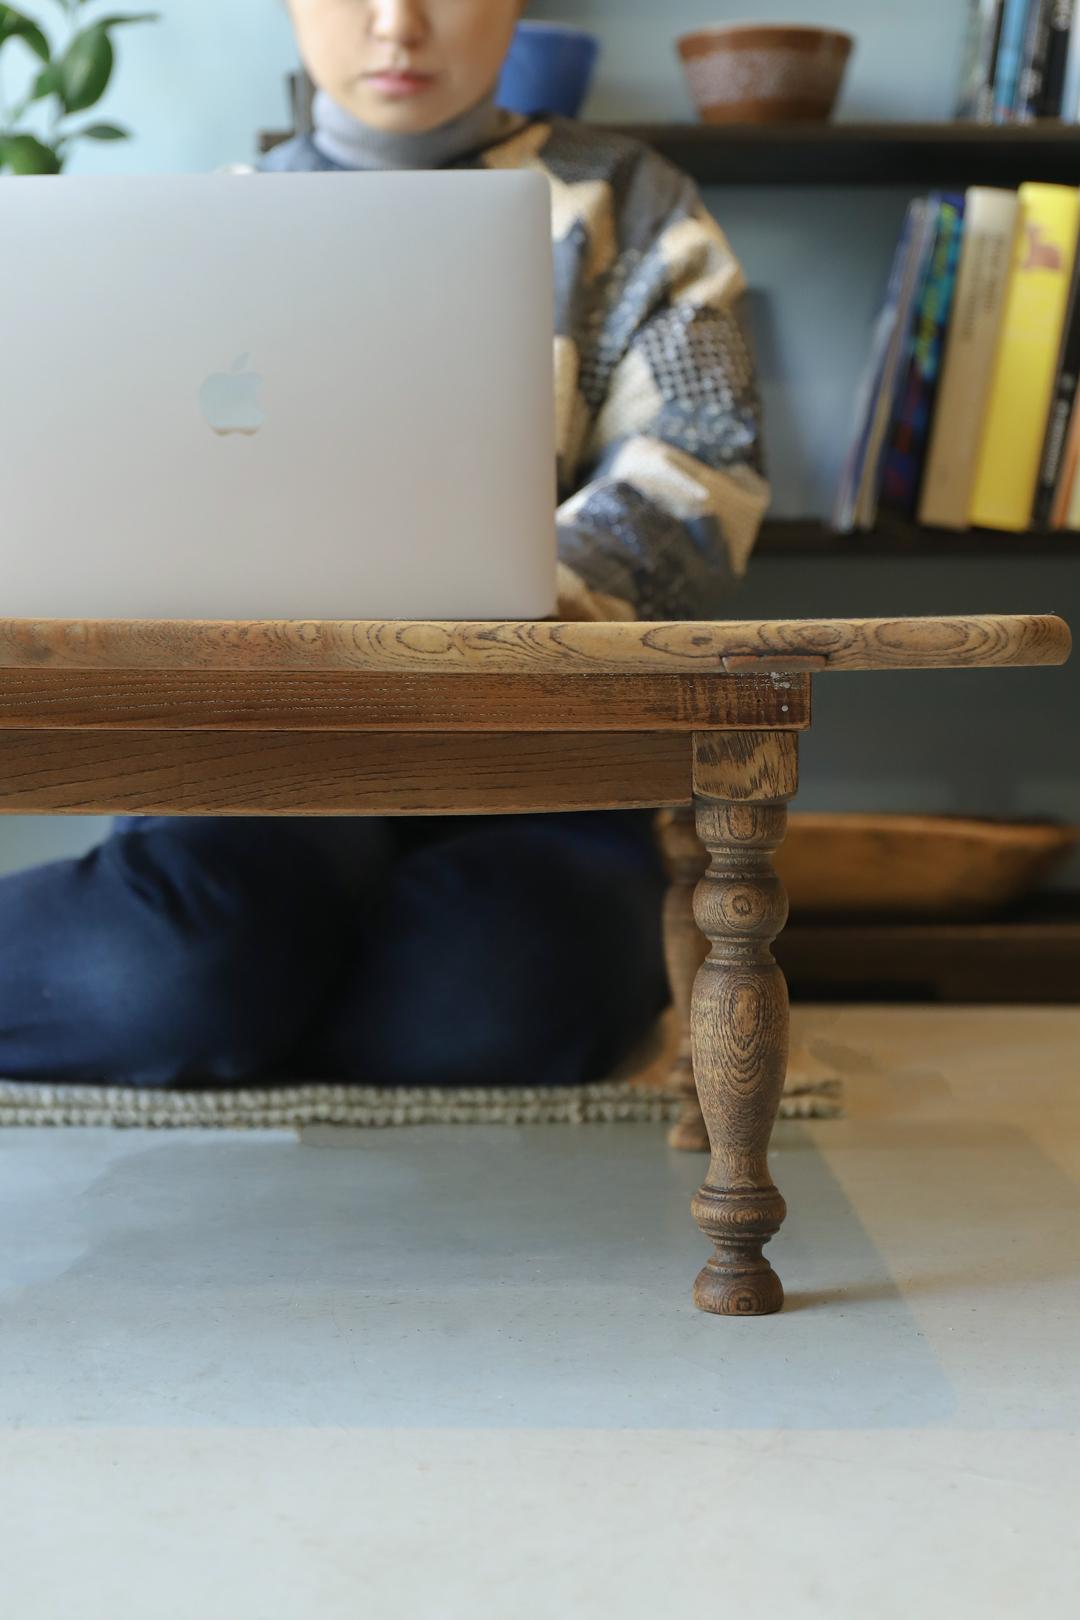 Japanese Vintage Modern Low Table/ジャパンヴィンテージ 座卓 ローテーブル ろくろ脚 レトロ シャビー 和モダン